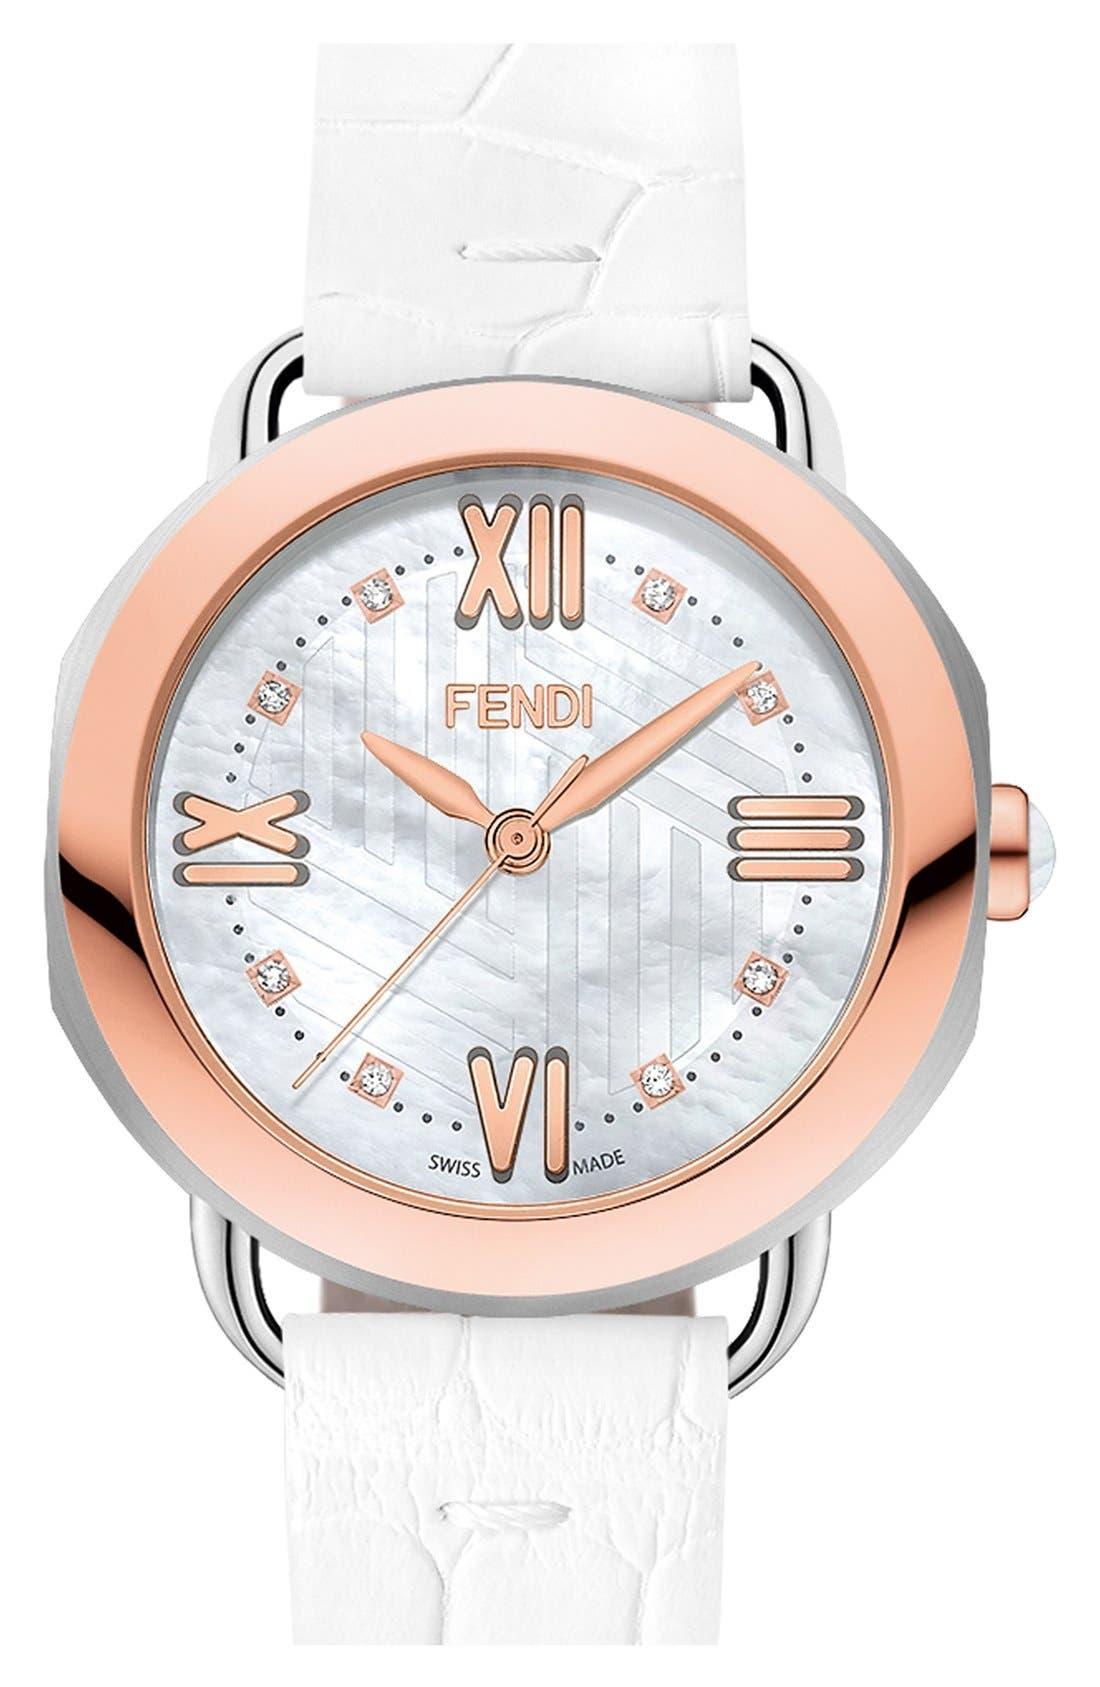 Main Image - Fendi 'Selleria' Leather Strap Watch, 36mm